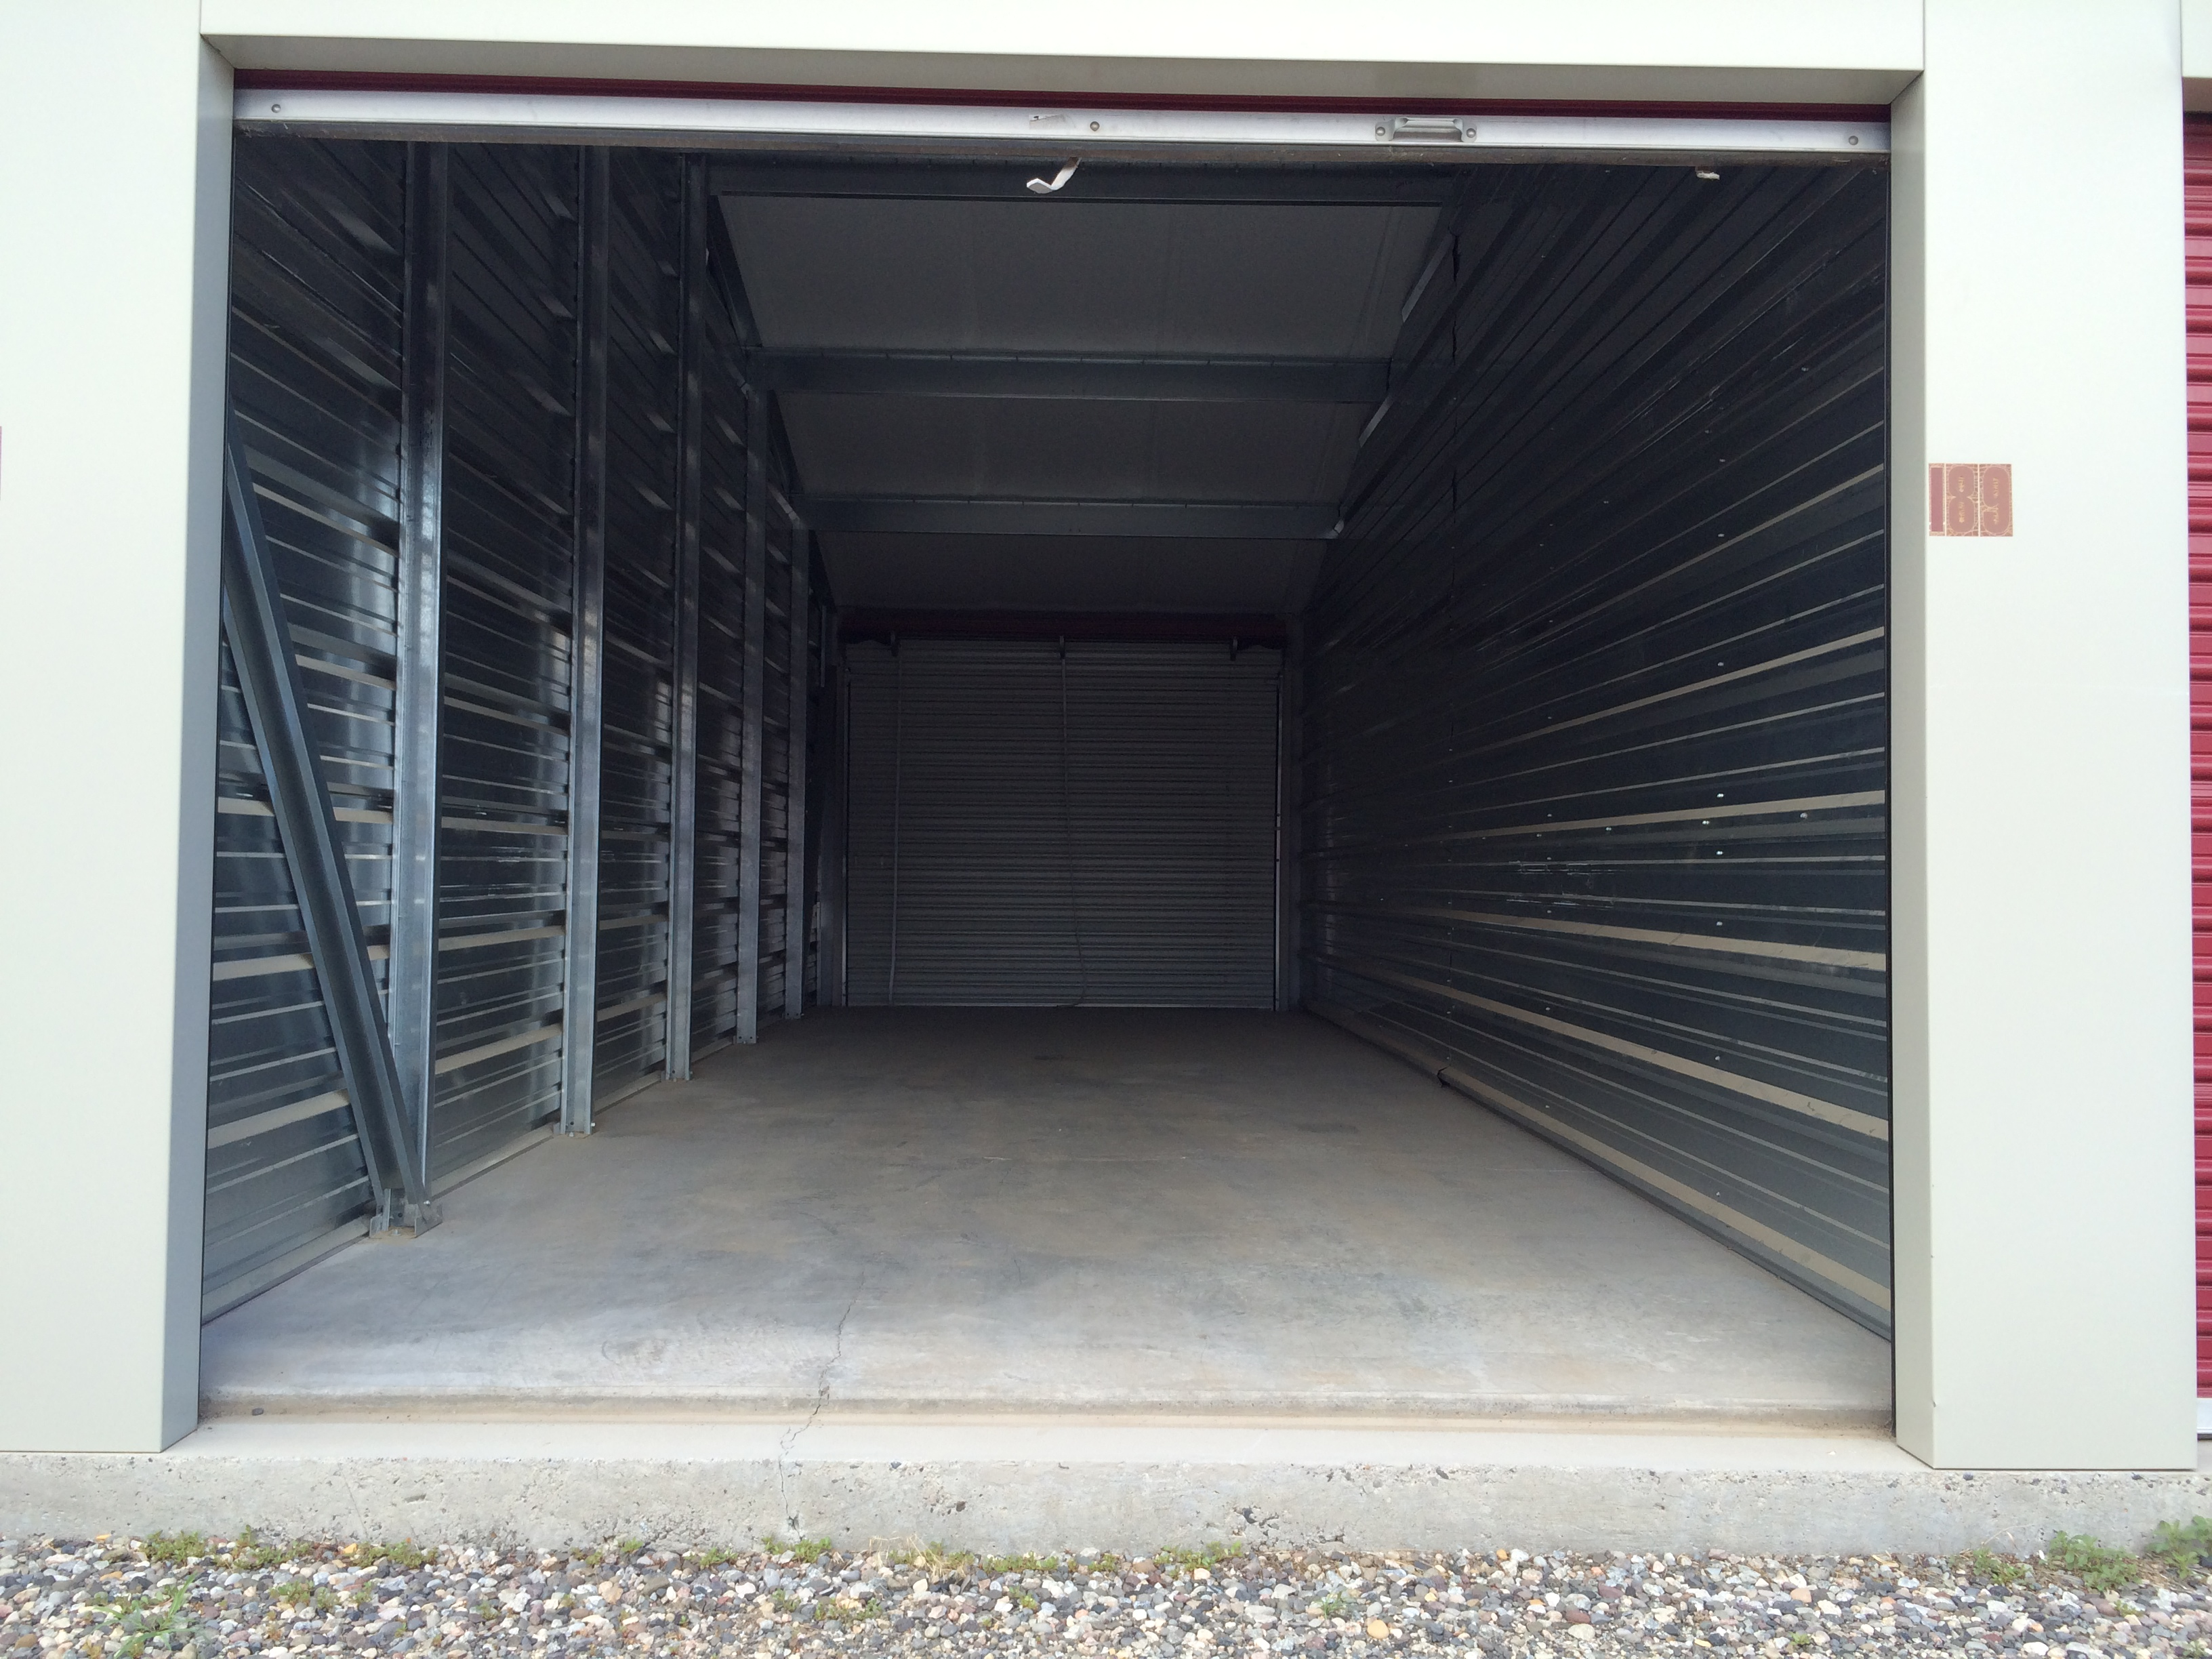 Self Storage Units | Bozeman | Belgrade, MT | Sizes & Rates